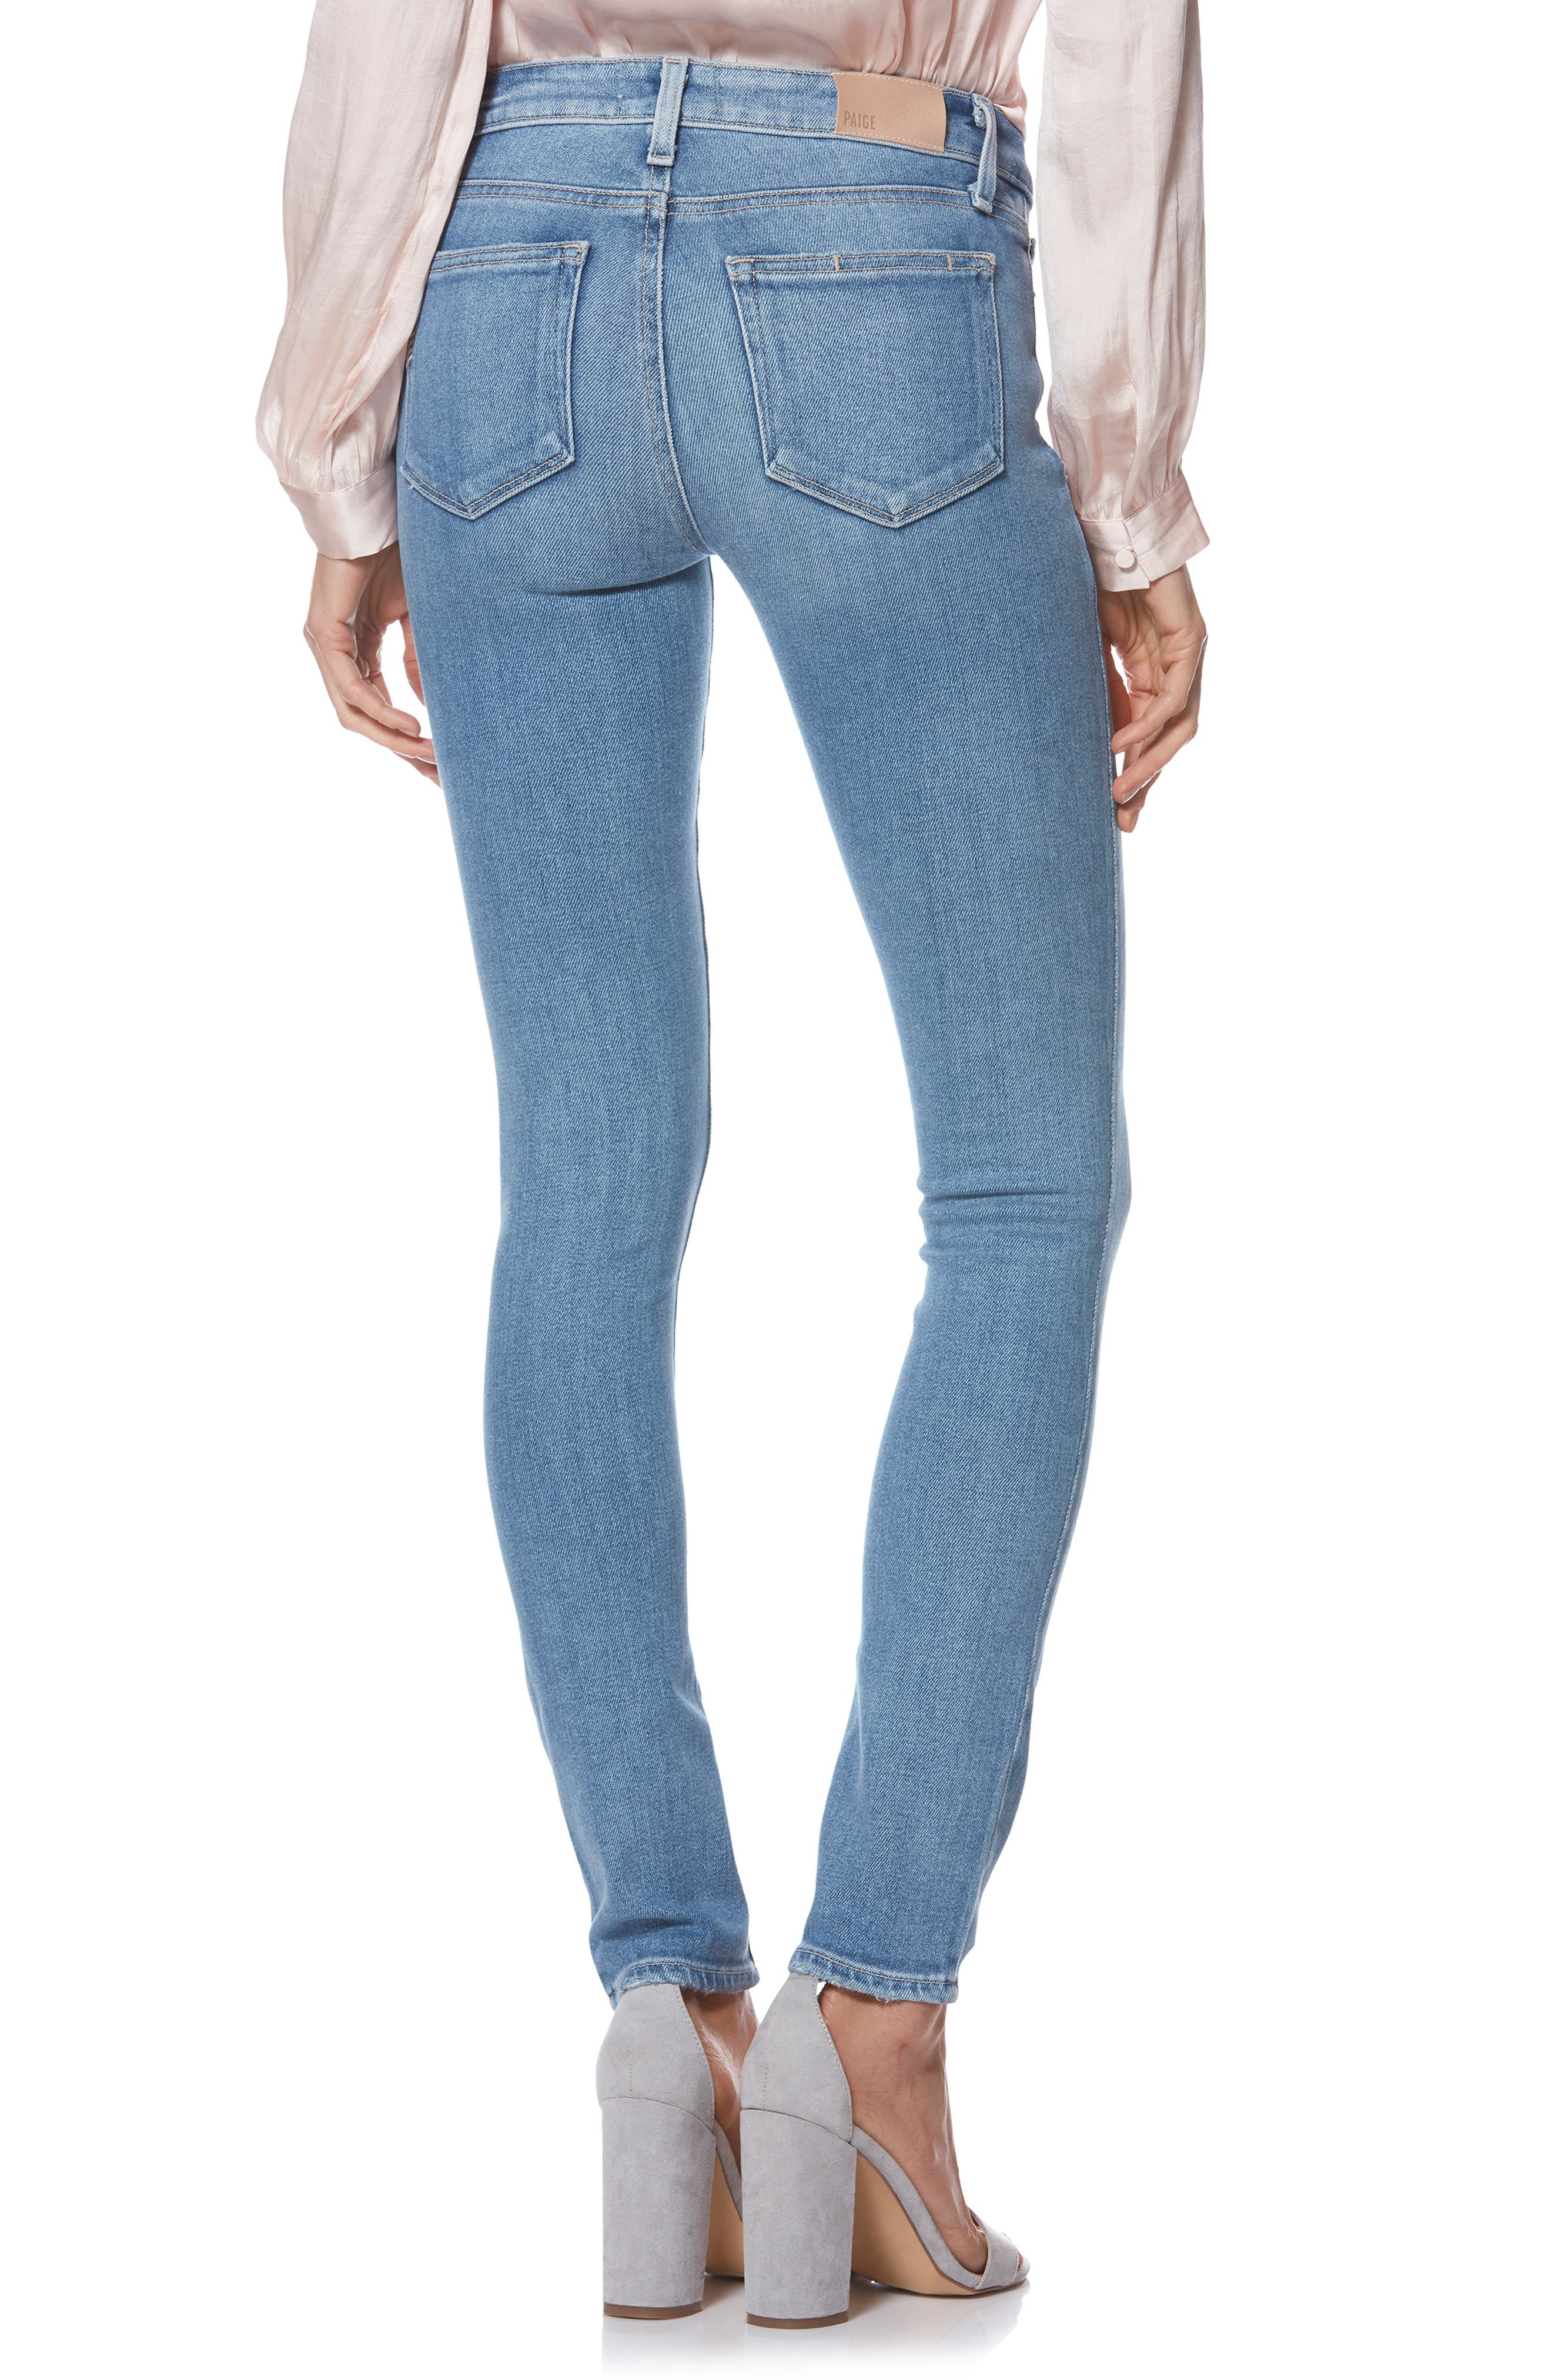 PAIGE,                             Verdugo Ultra Skinny Jeans,                             Alternate thumbnail 2, color,                             KAYSON DISTRESSED